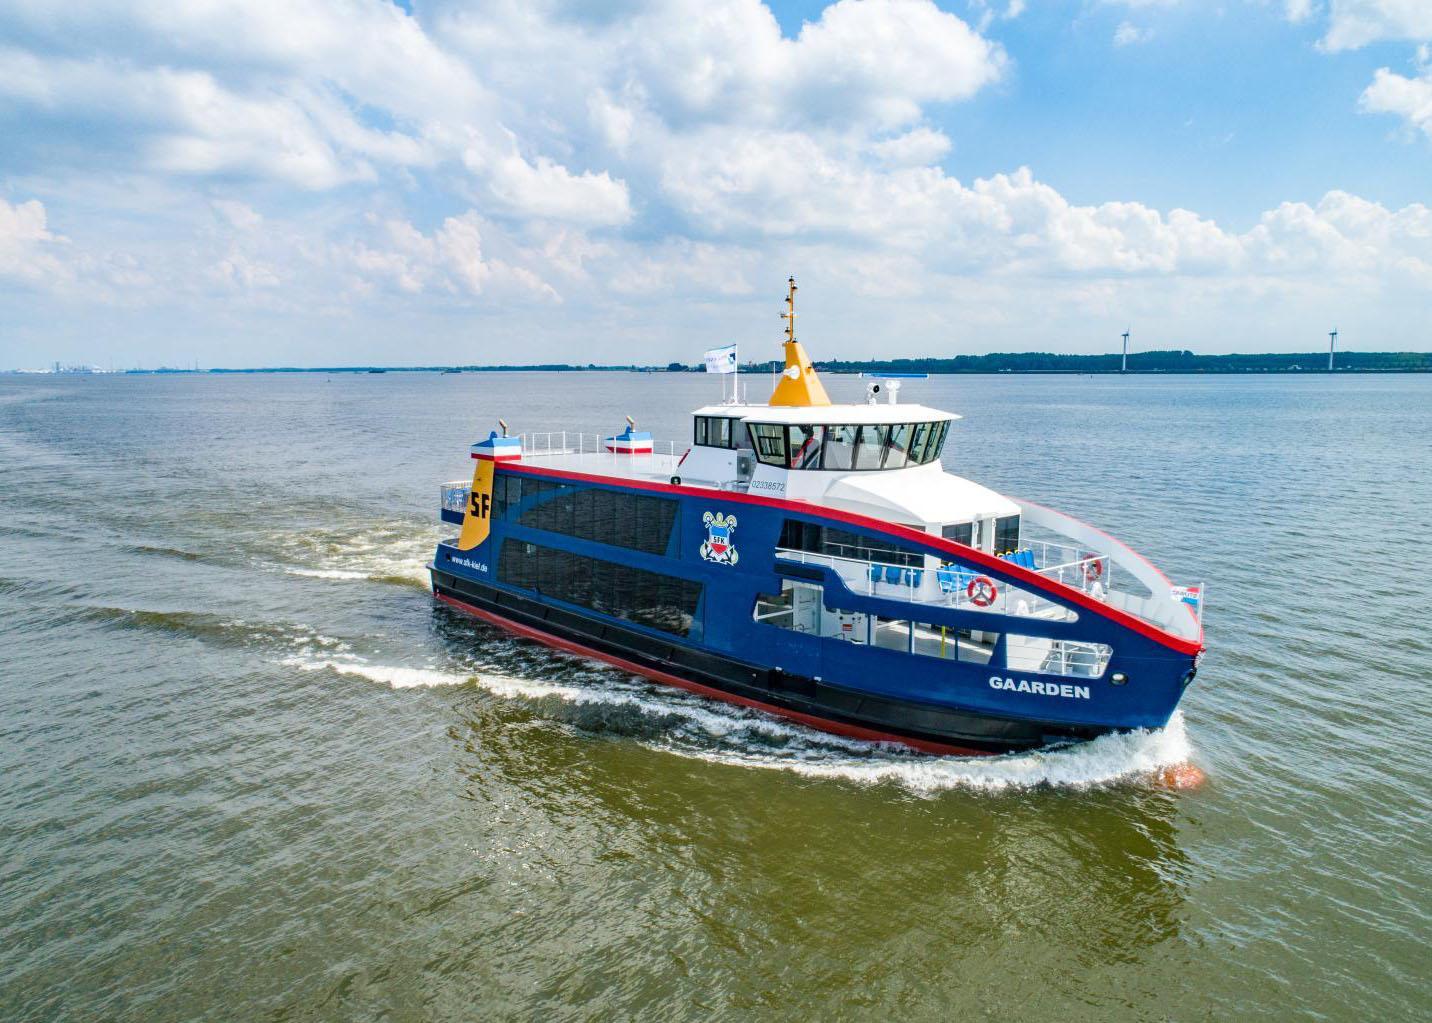 Veerdienst 180517 Holland Shipyard SFK ms Gaarden RL621F RiverLine